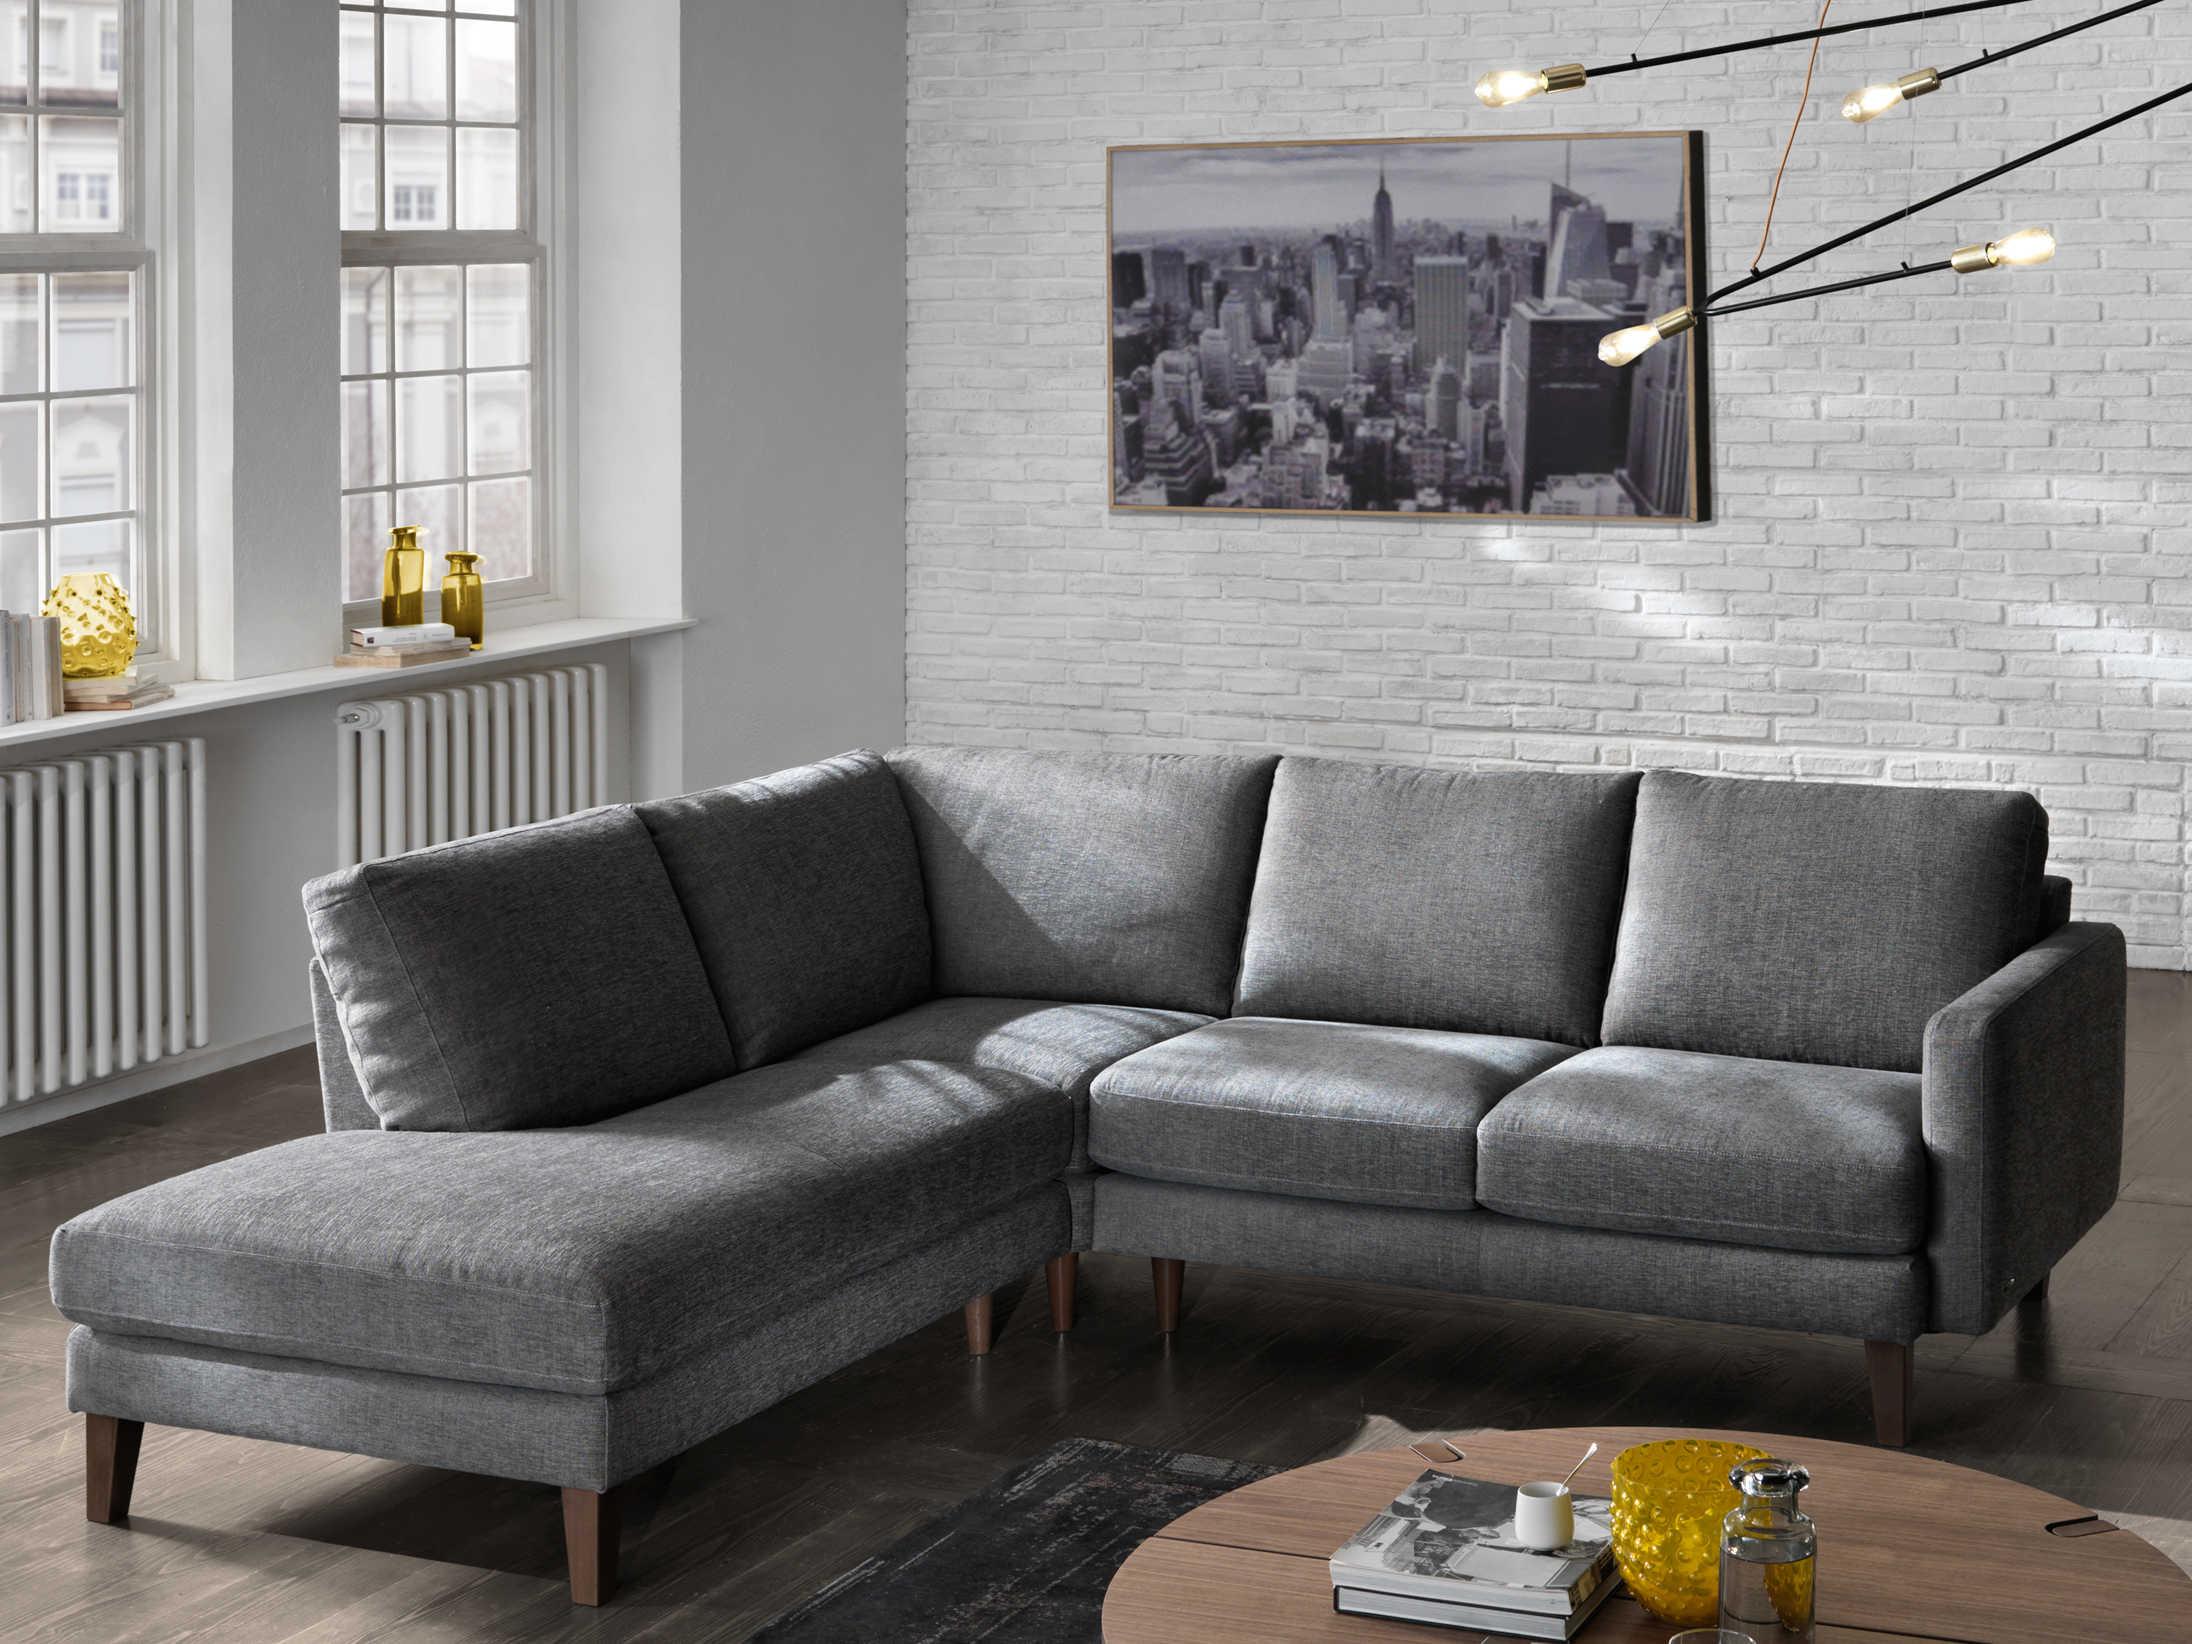 Natuzzi Editions Ercole Sectional Sofa